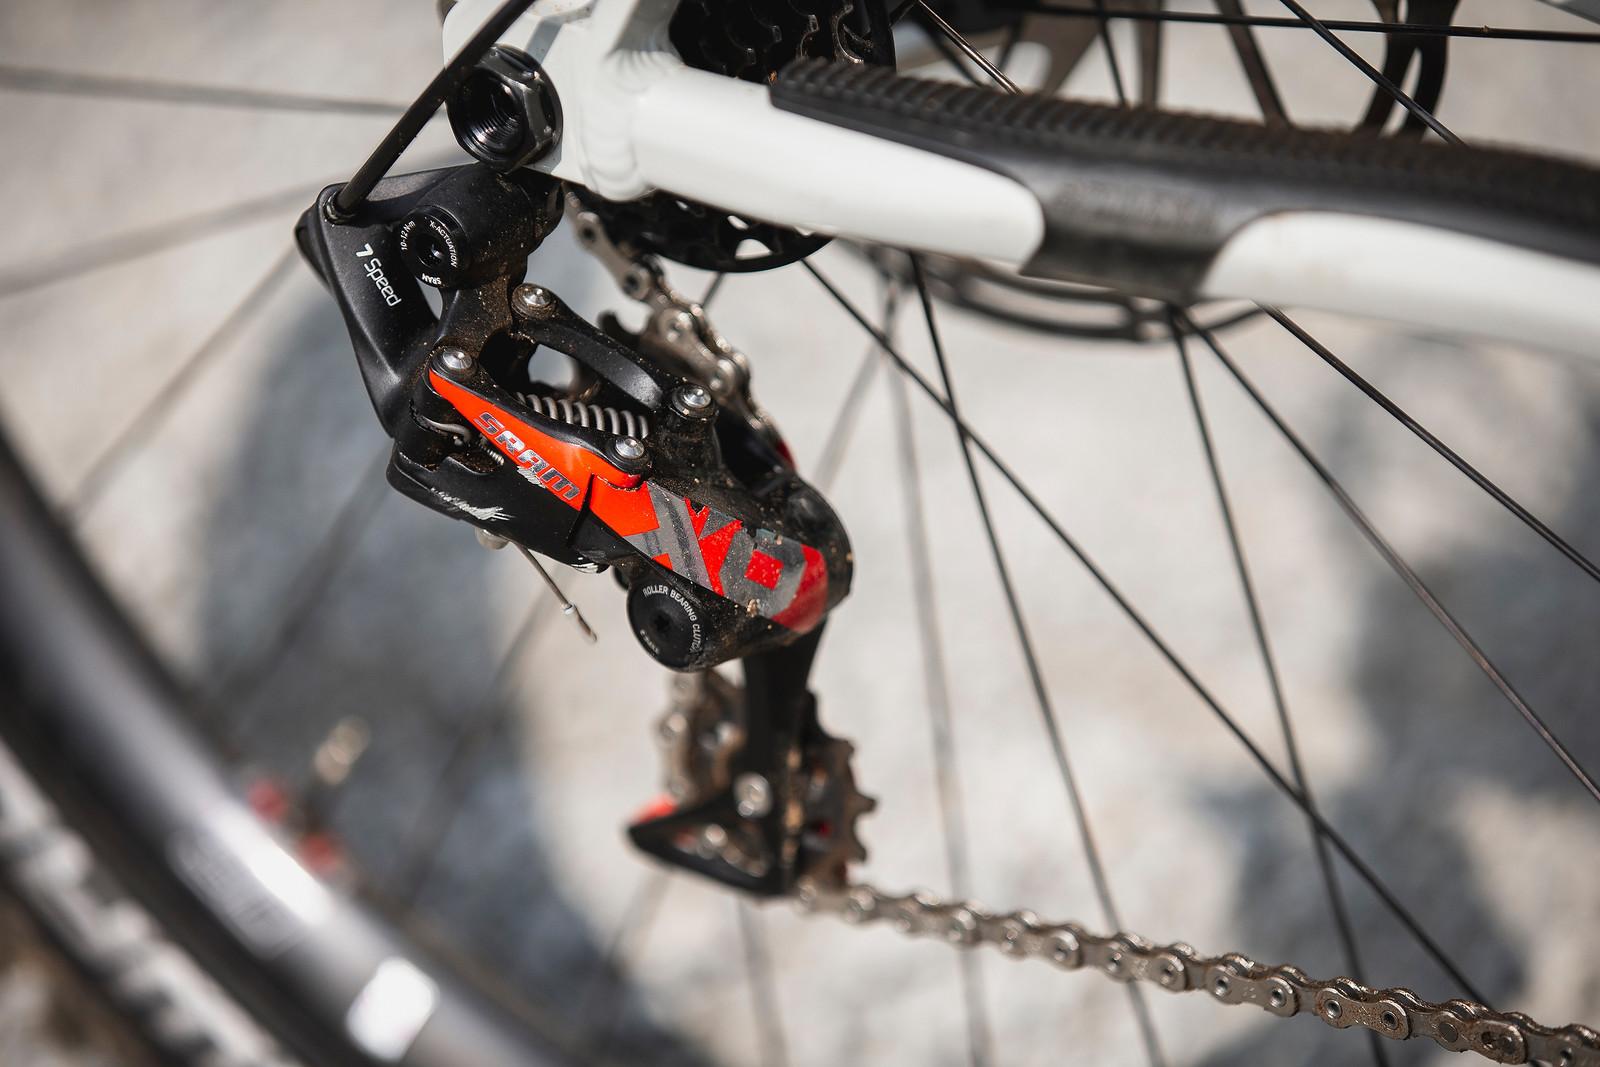 SRAM X01 DH 7-speed derailleur - WINNING BIKE - Amaury Pierron's Commencal Supreme DH - Mountain Biking Pictures - Vital MTB